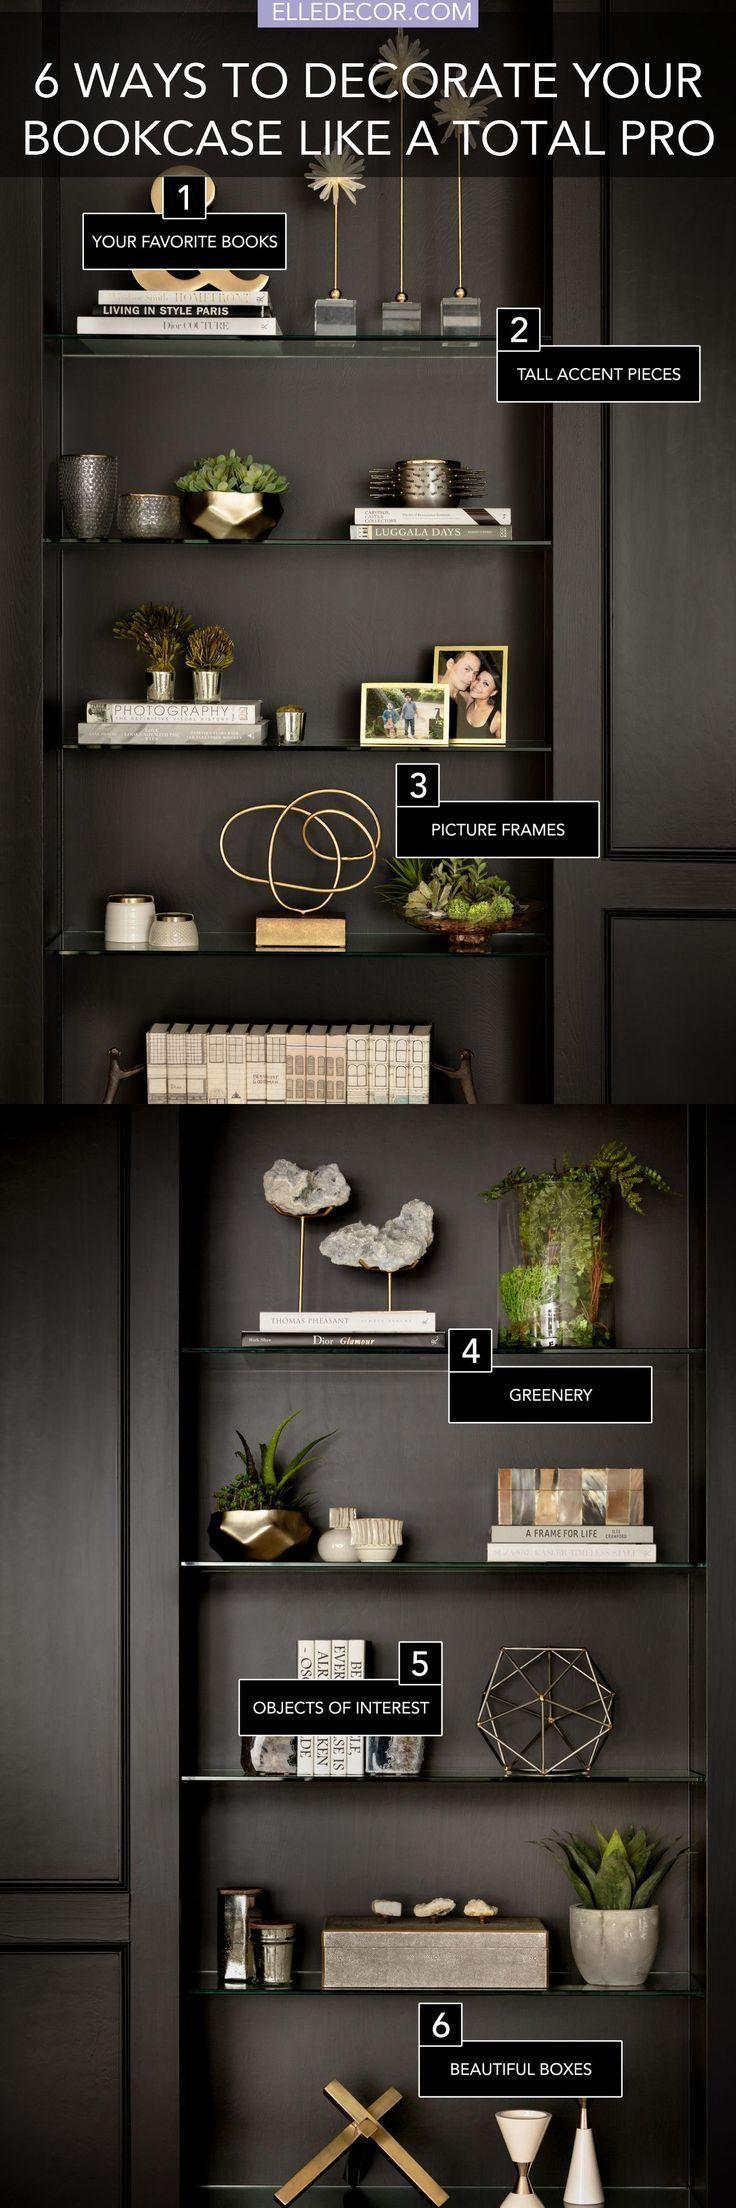 6 secrets to a perfectly styled bookcase bookshelf a shelf decorating ideasmodern